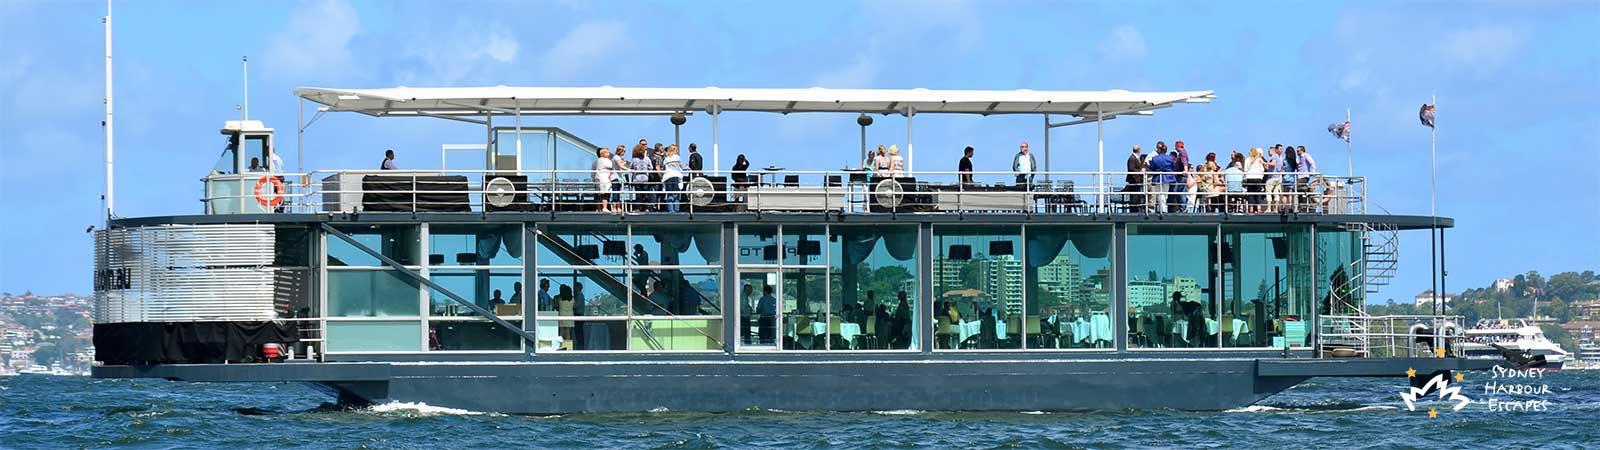 Starship Aqua Boat At Sydney Harbour